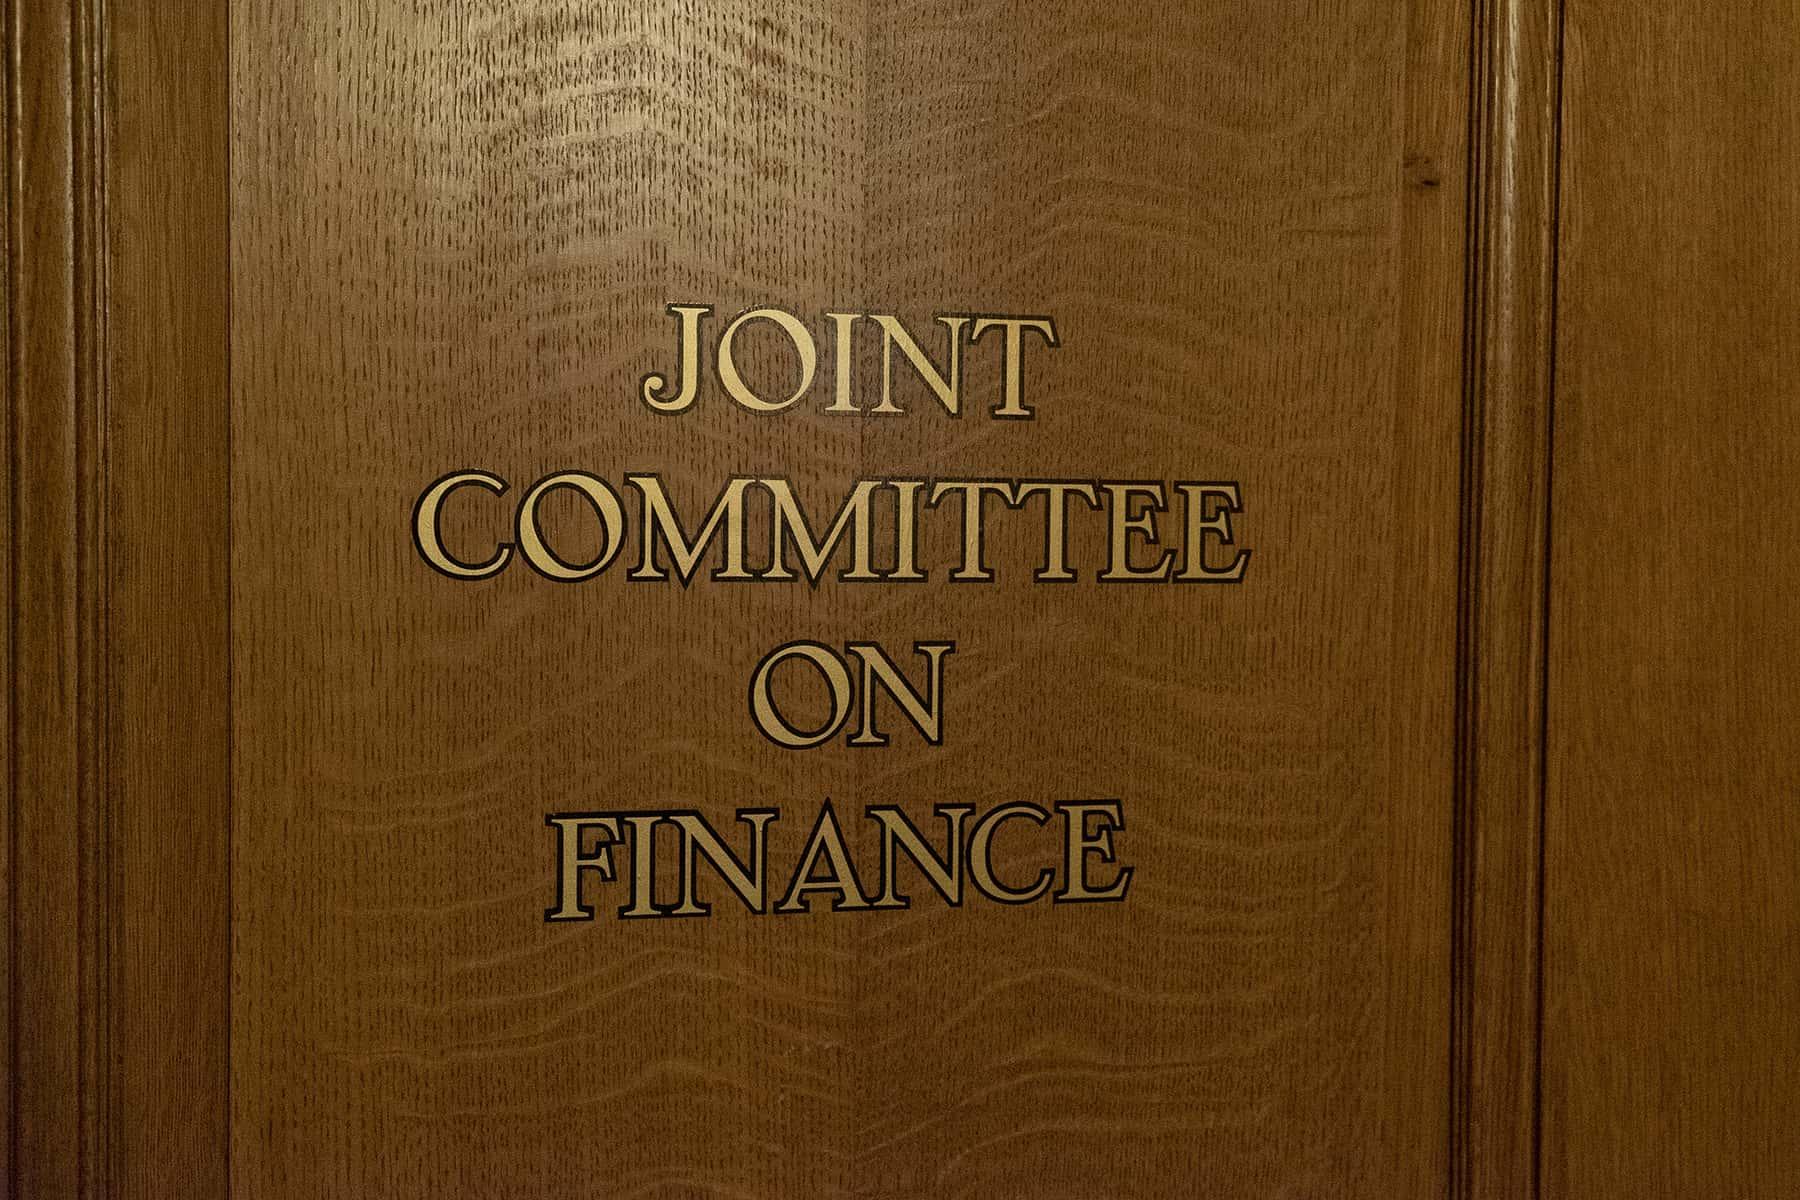 050921_FinanceCommittee_02